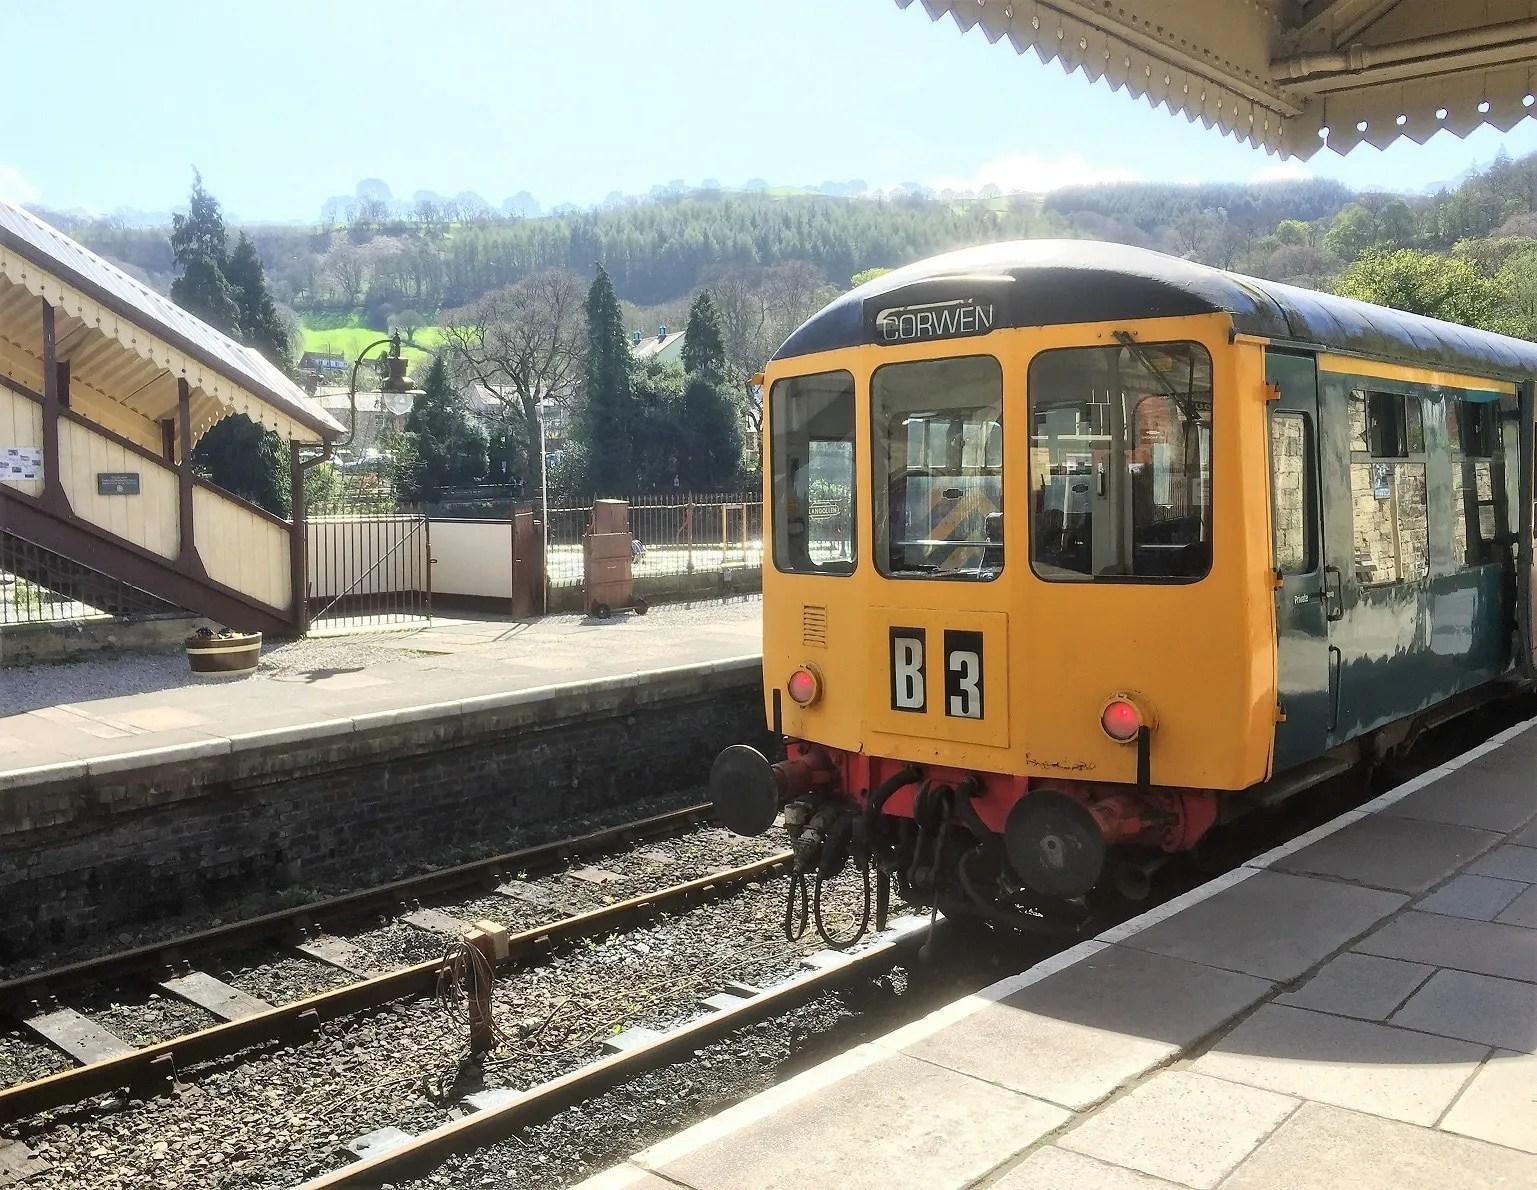 Birmingham Rail & Carriage Works BR Class 104 in Llangollen Railway Station